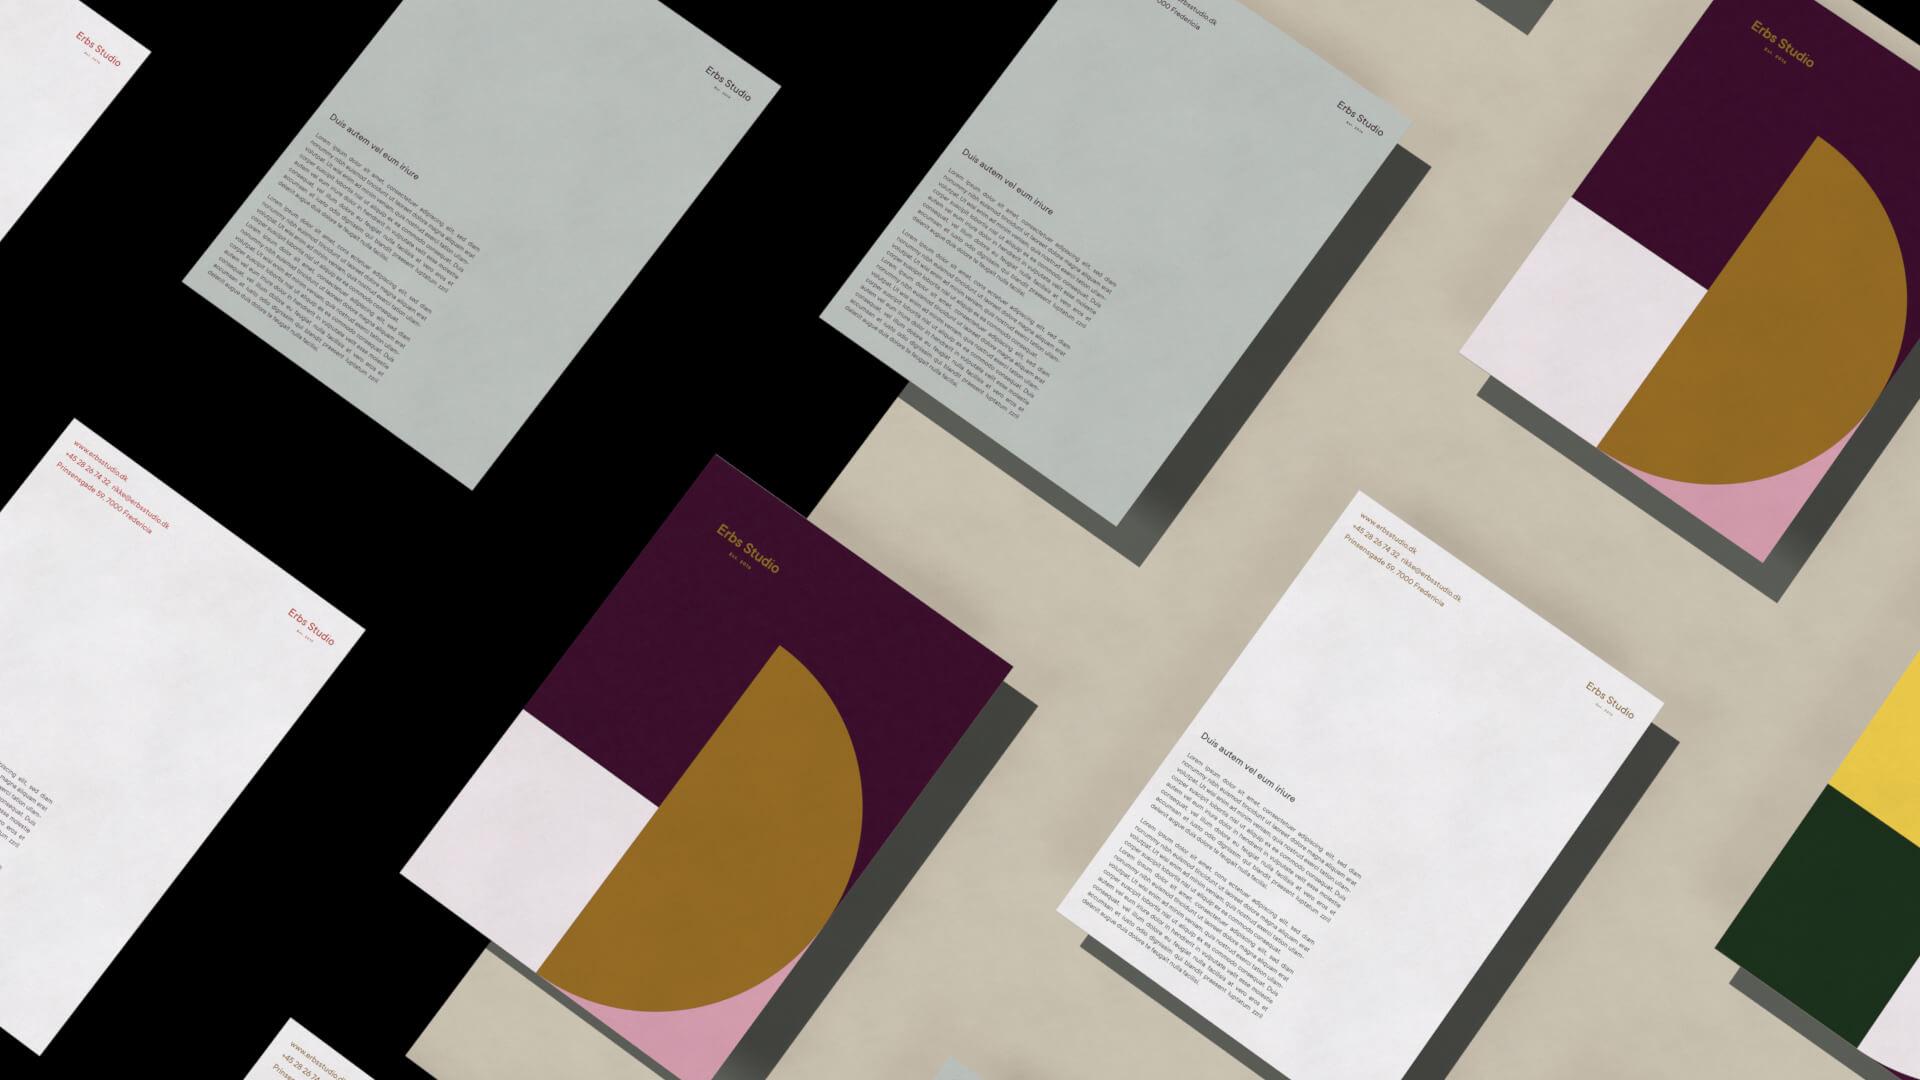 Erbs Studio Visuel Identitet Print Brevpapir 3